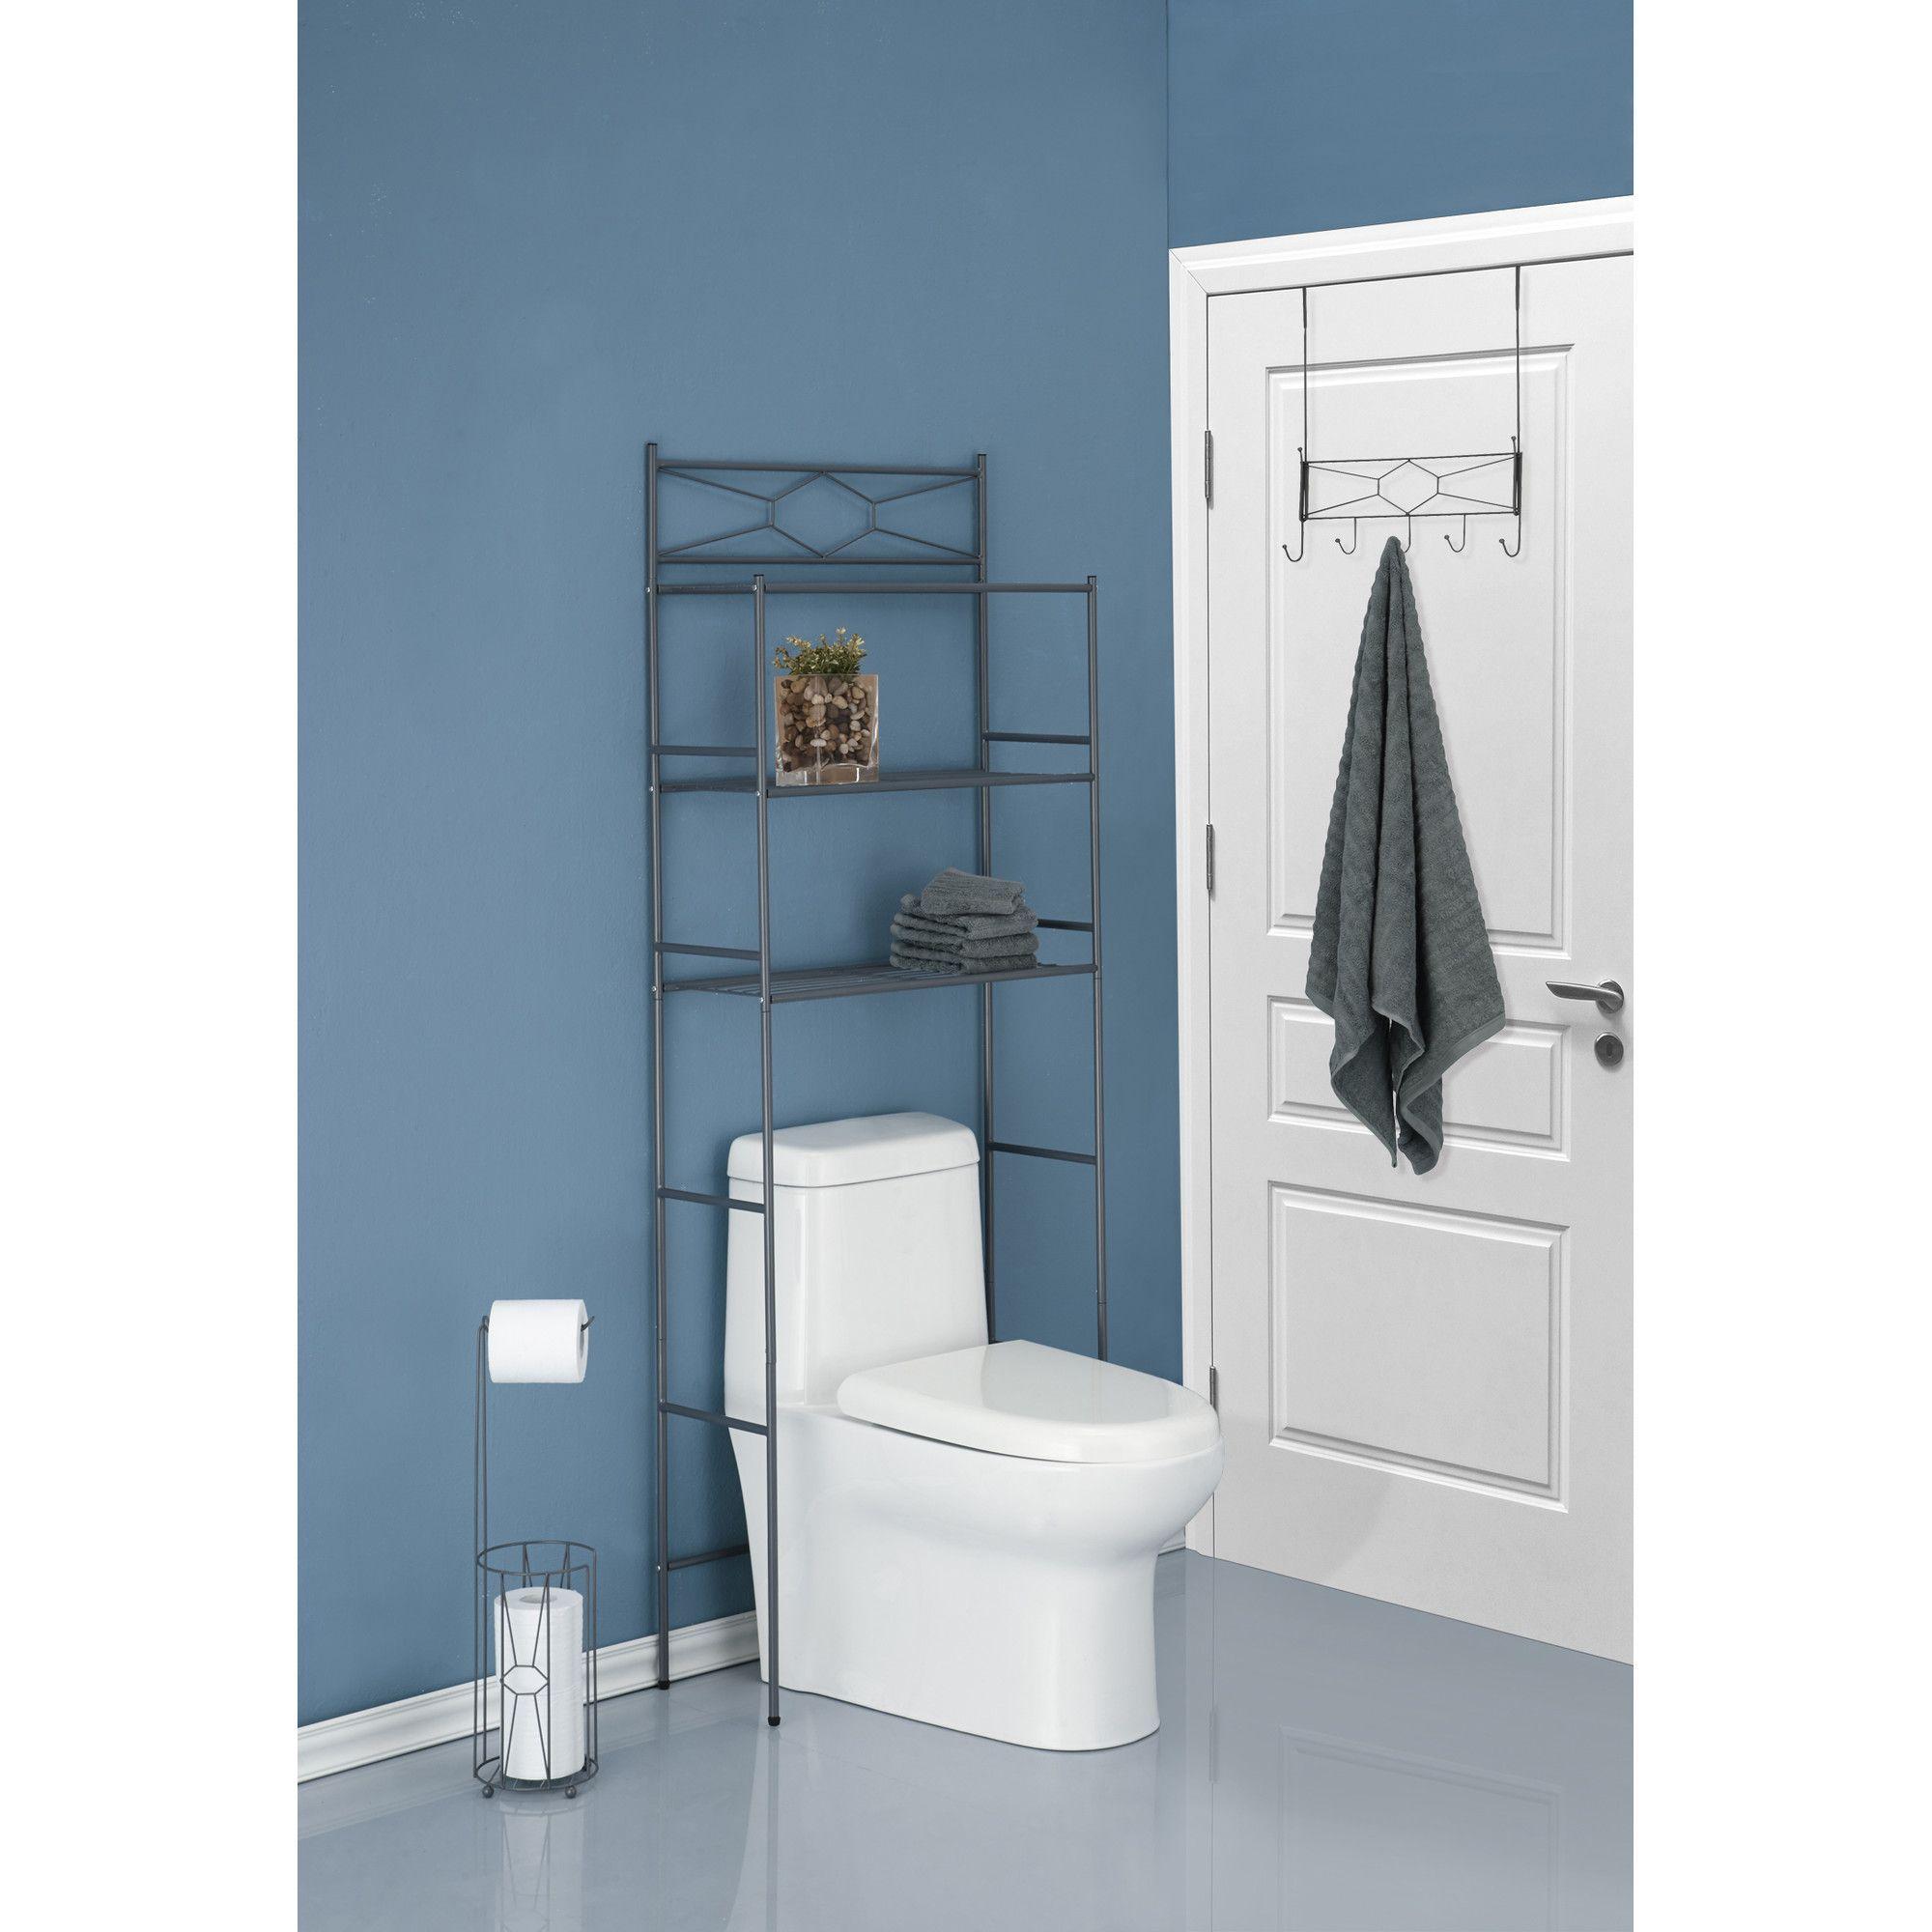 Fantastic Bathroom Shower Shelf Vignette - Bathroom - knawi.com